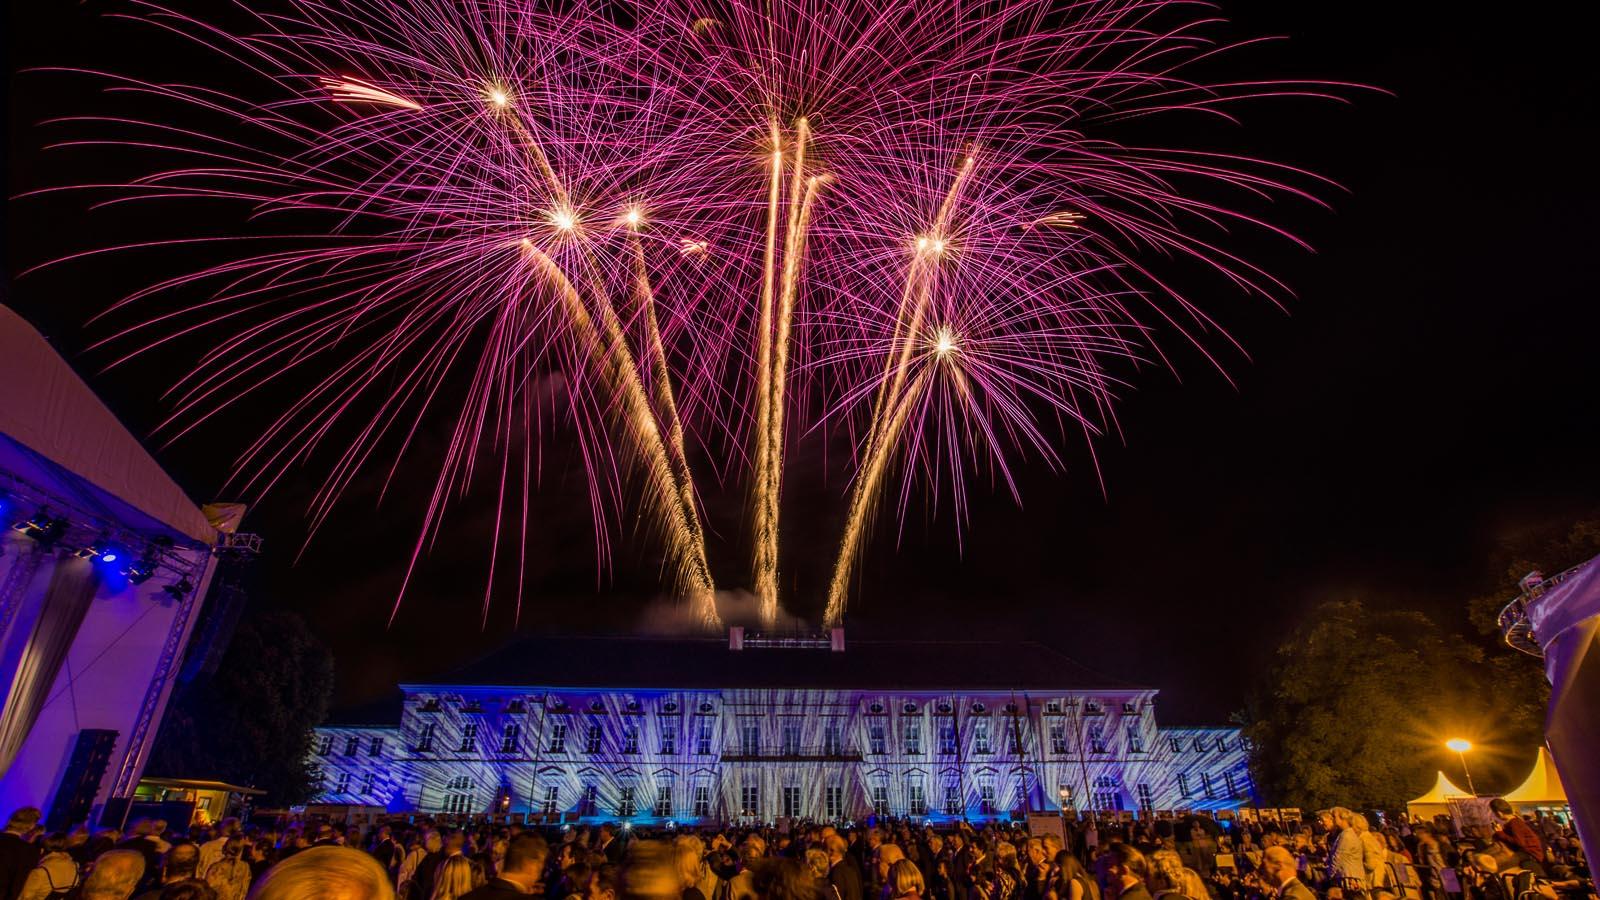 Schloss Bellevue Buergerfest des Bundespraesidenten Hoehenfeuerwerk